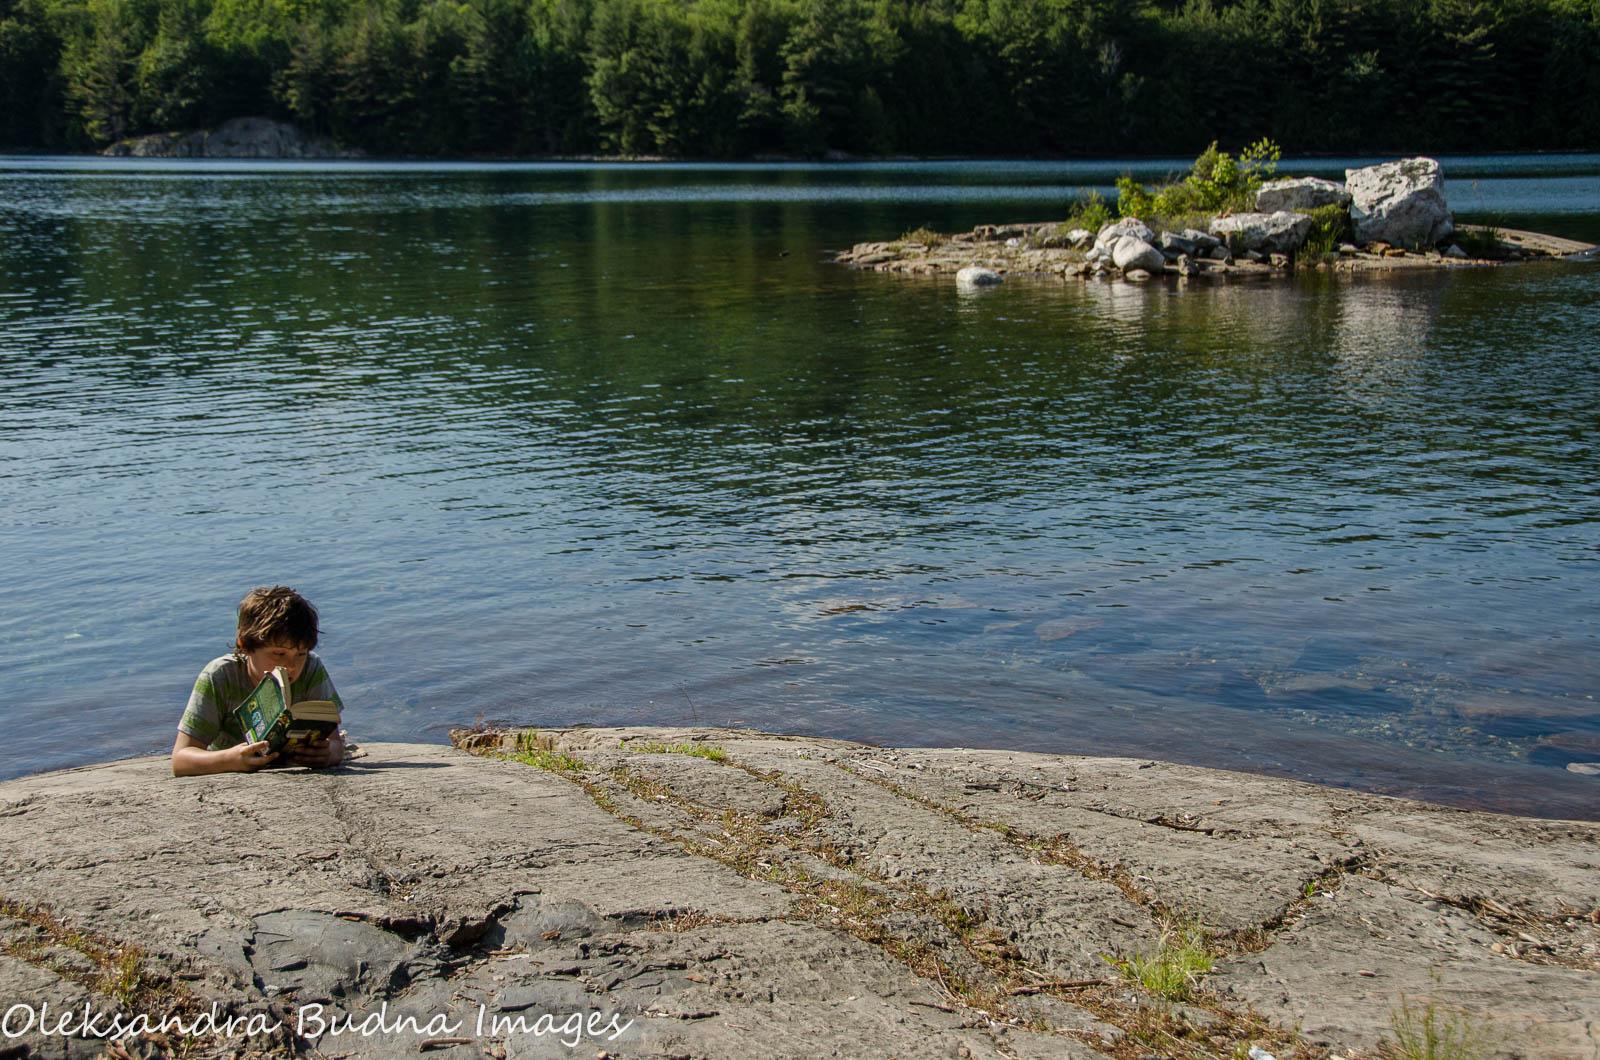 Overcoming the perils of canoe lake essay